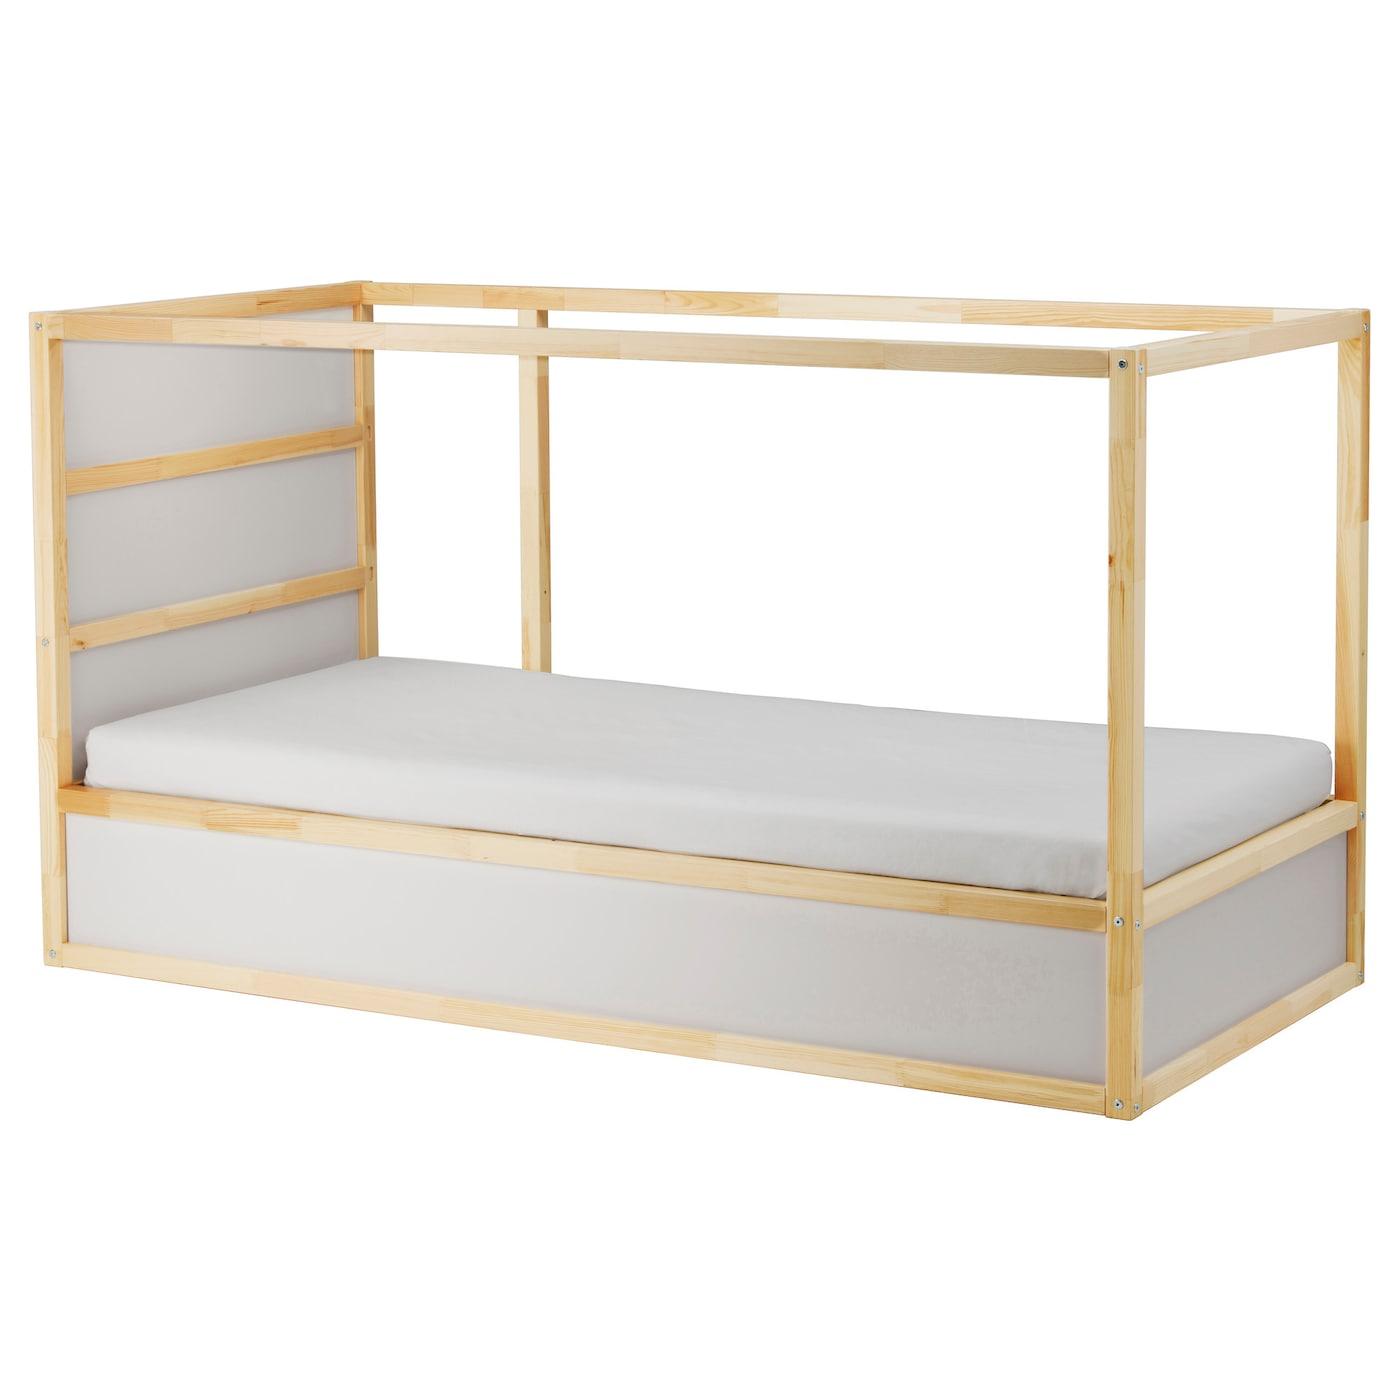 Lits Juniors Filles Garcons Barrieres De Lit Lits Evolutifs Ikea